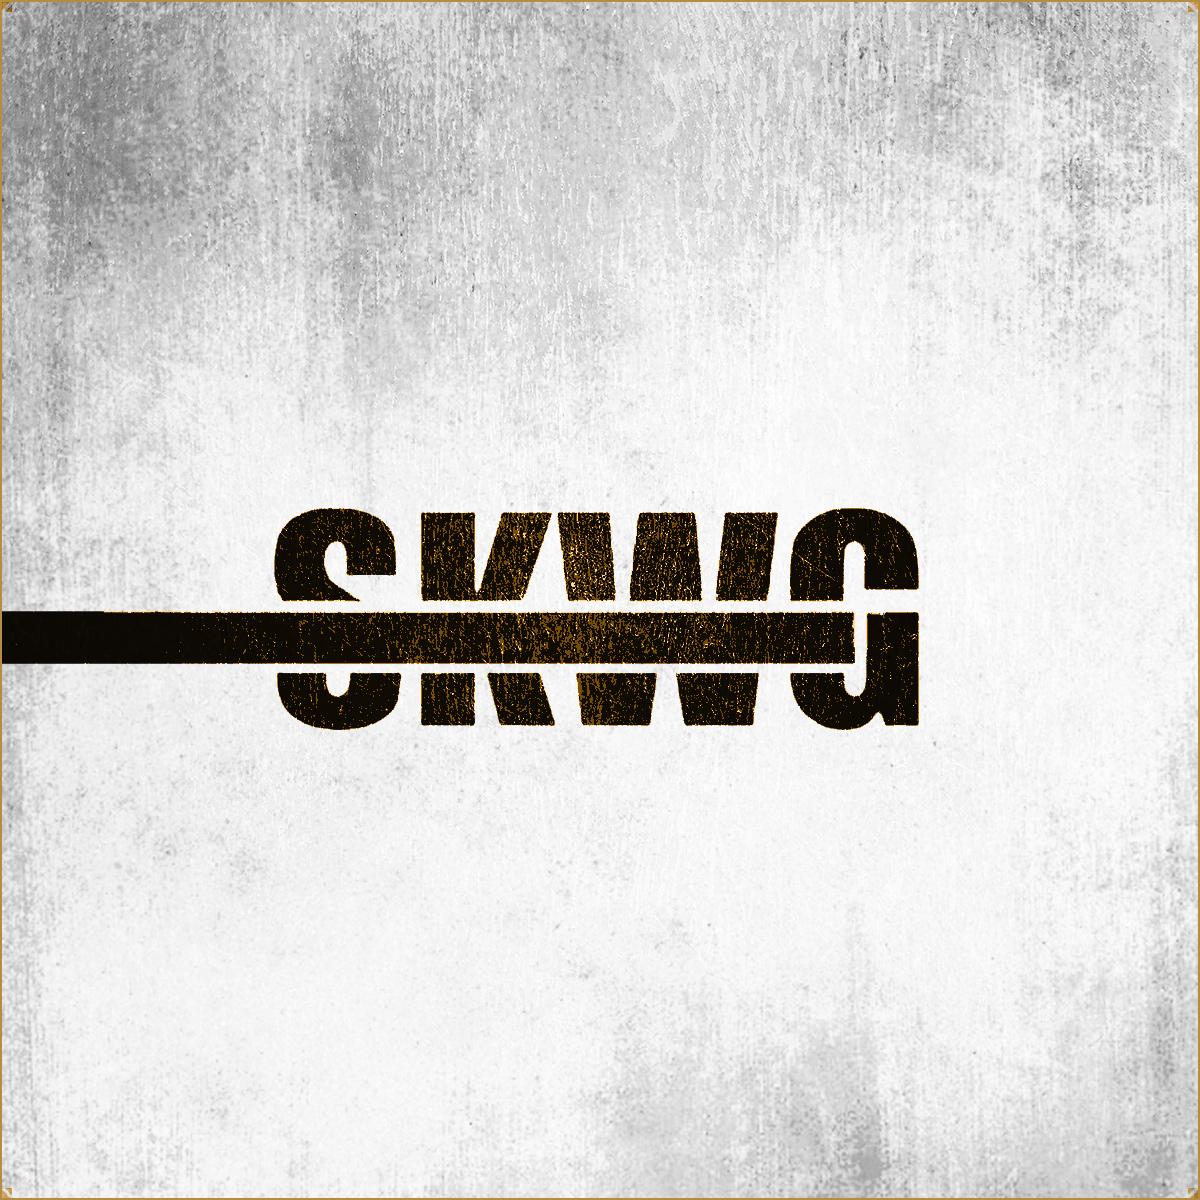 BricolArts - Artist profile picture - Skawager | SKWG logo